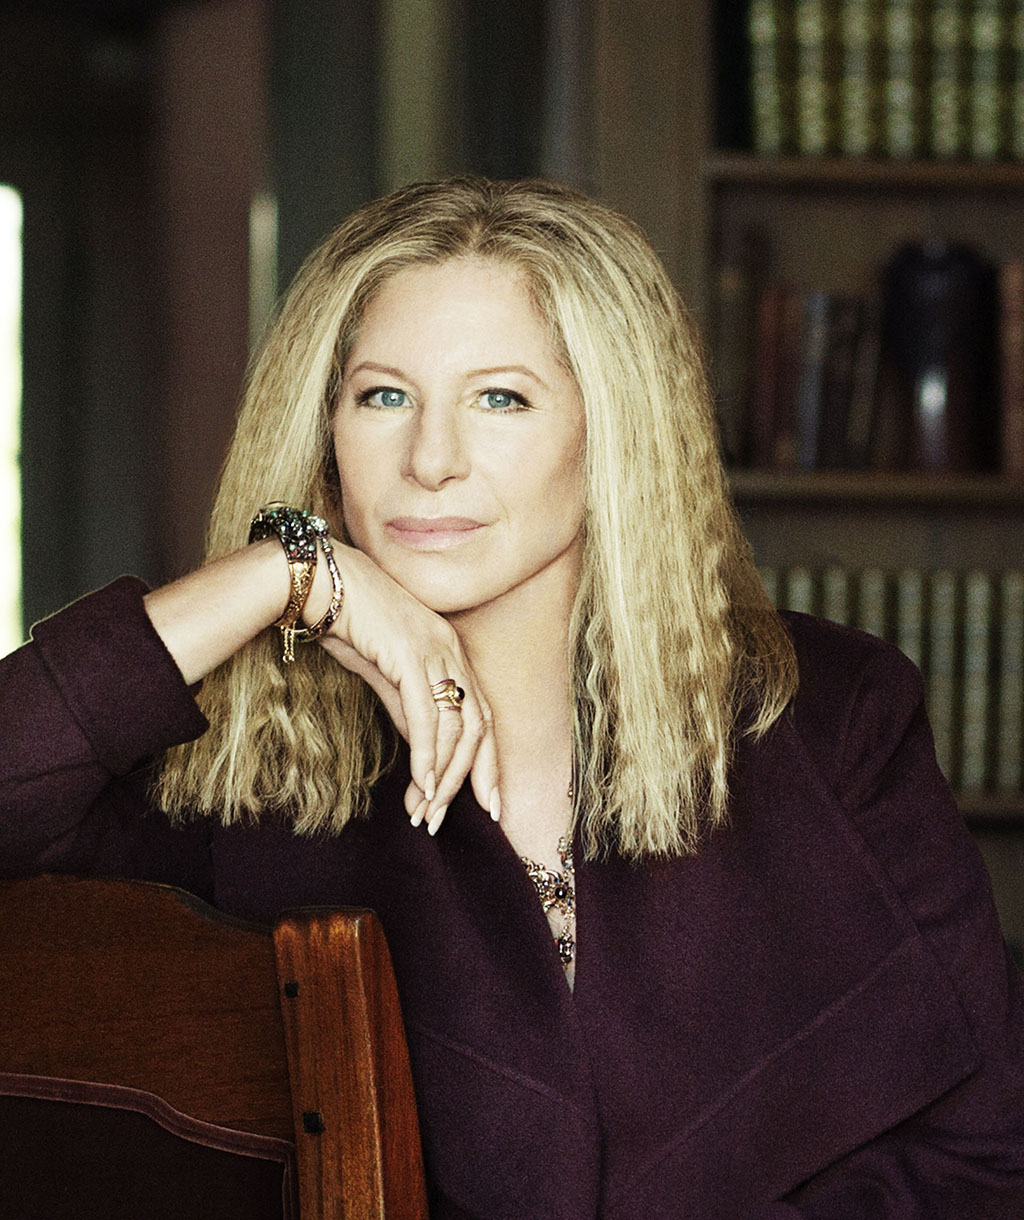 Barbra Streisand Biography